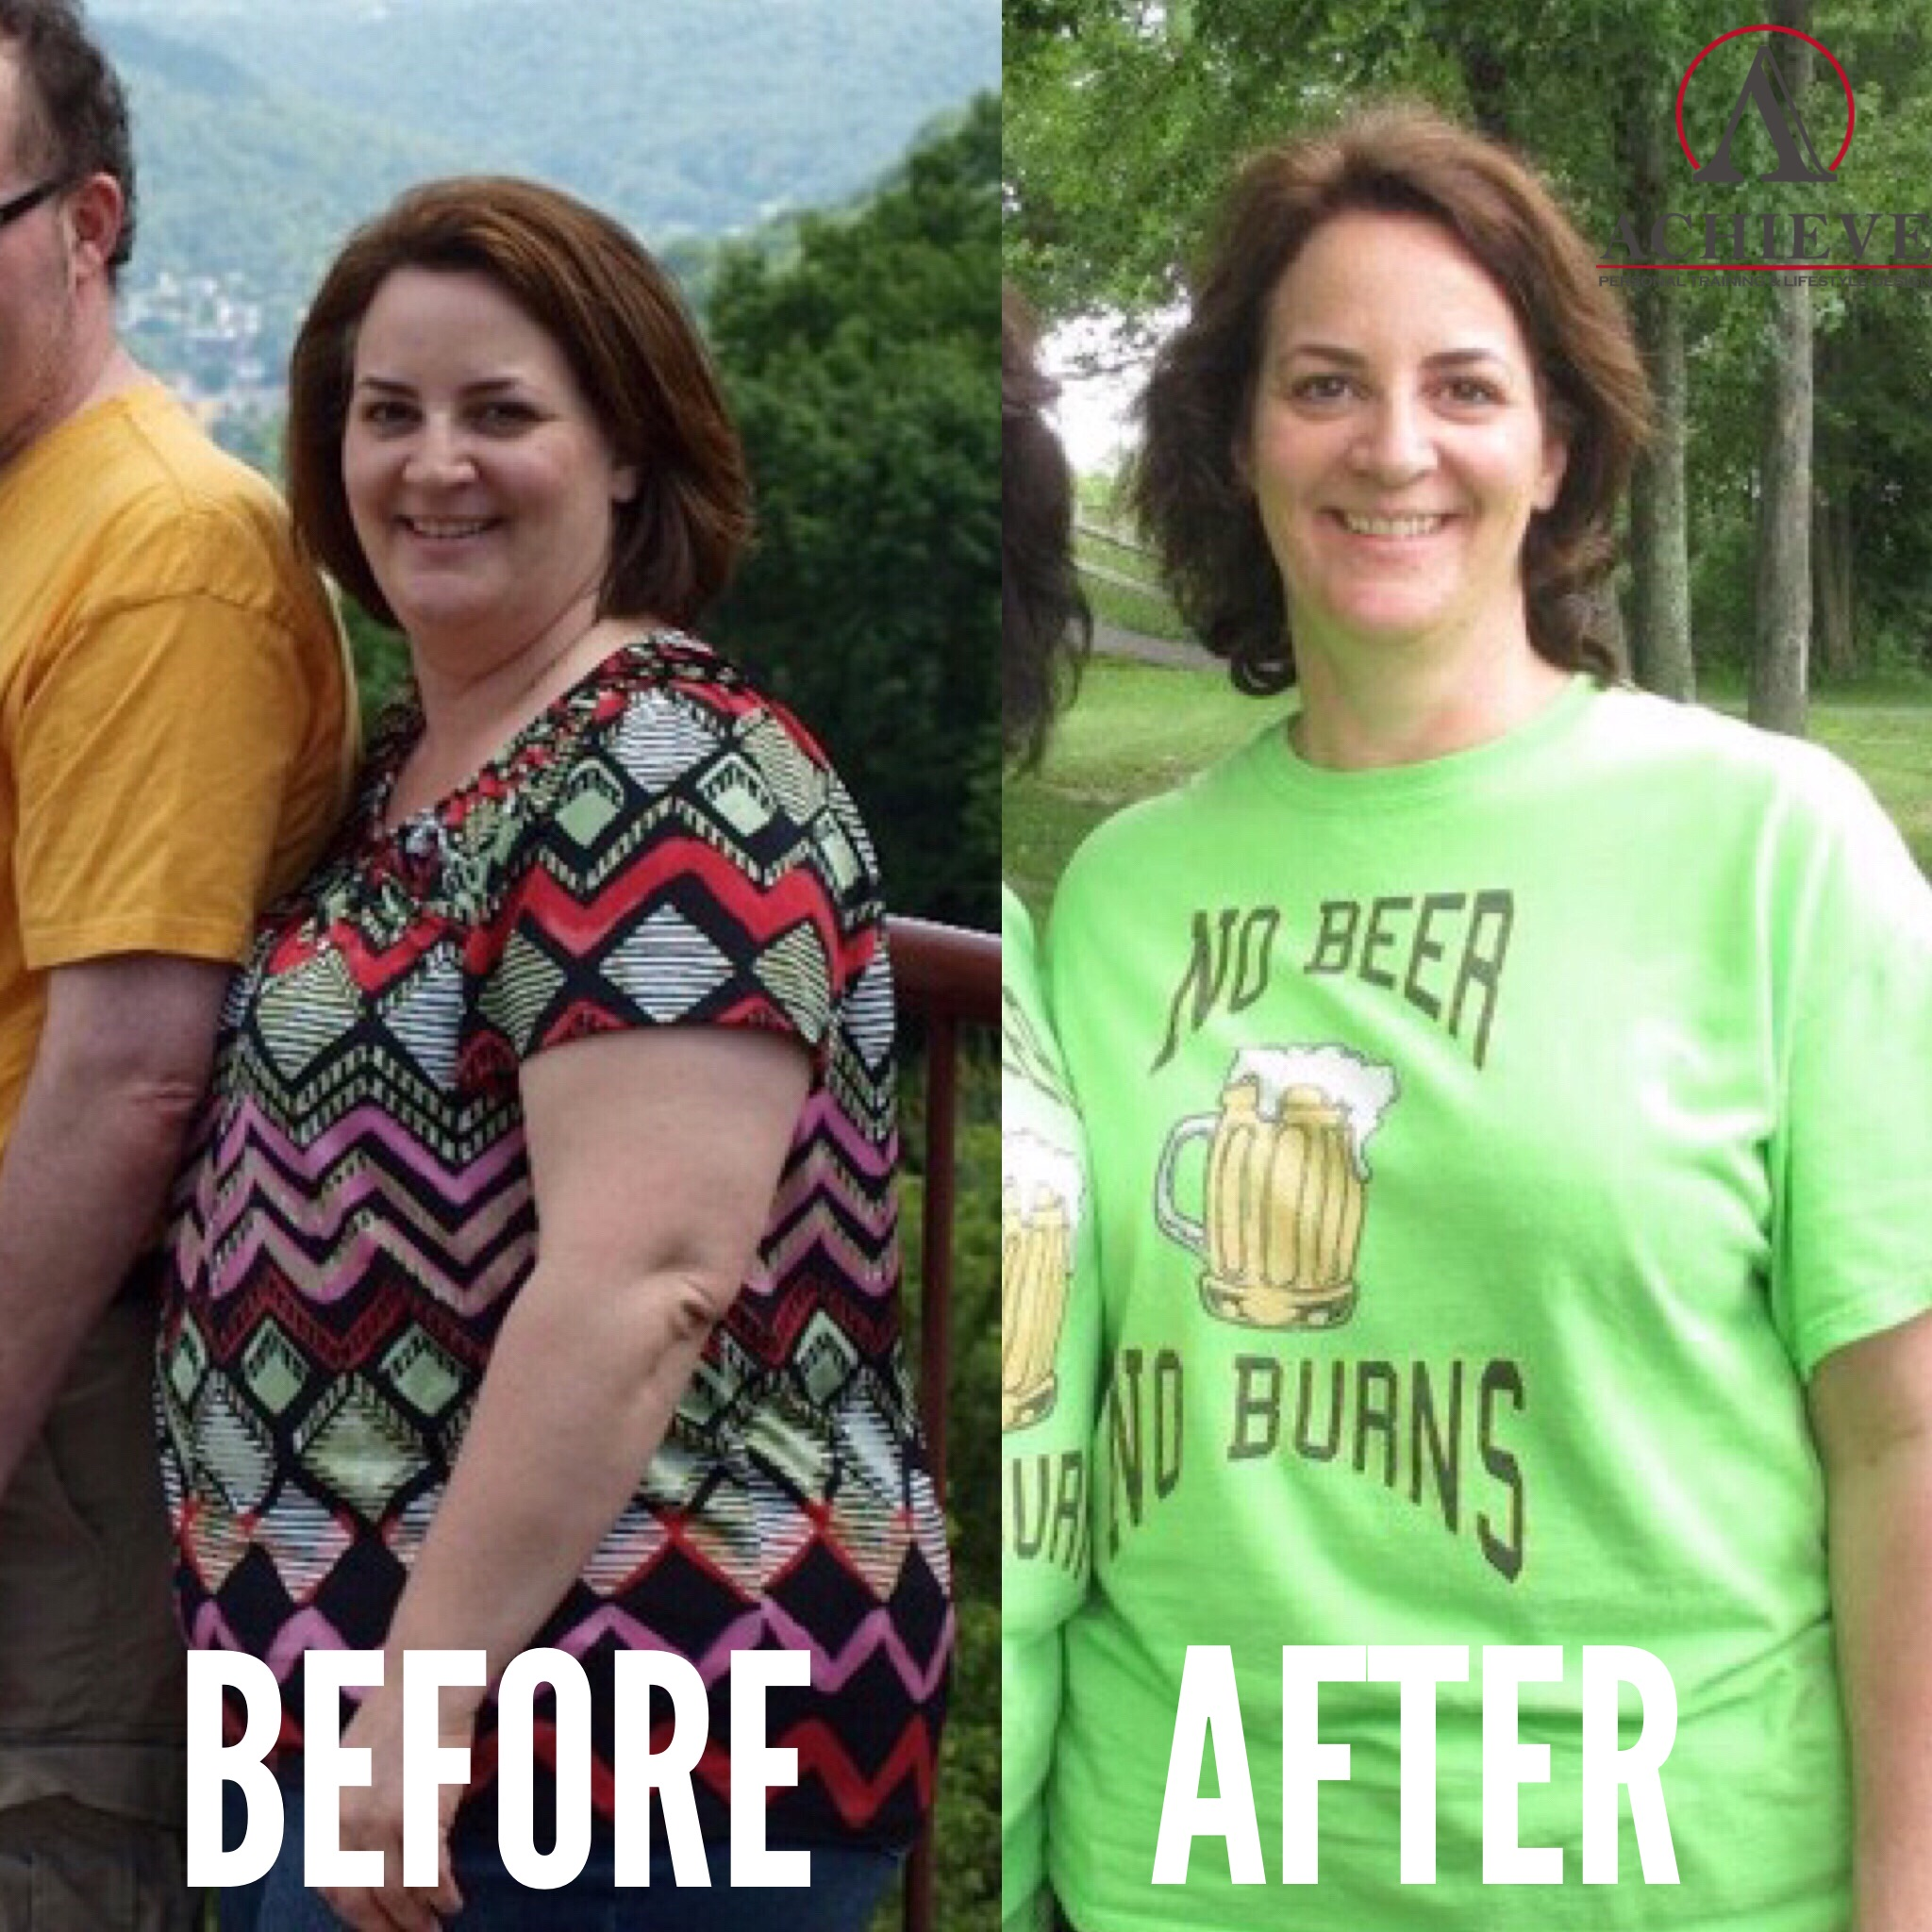 Susan Lost 70 lbs!